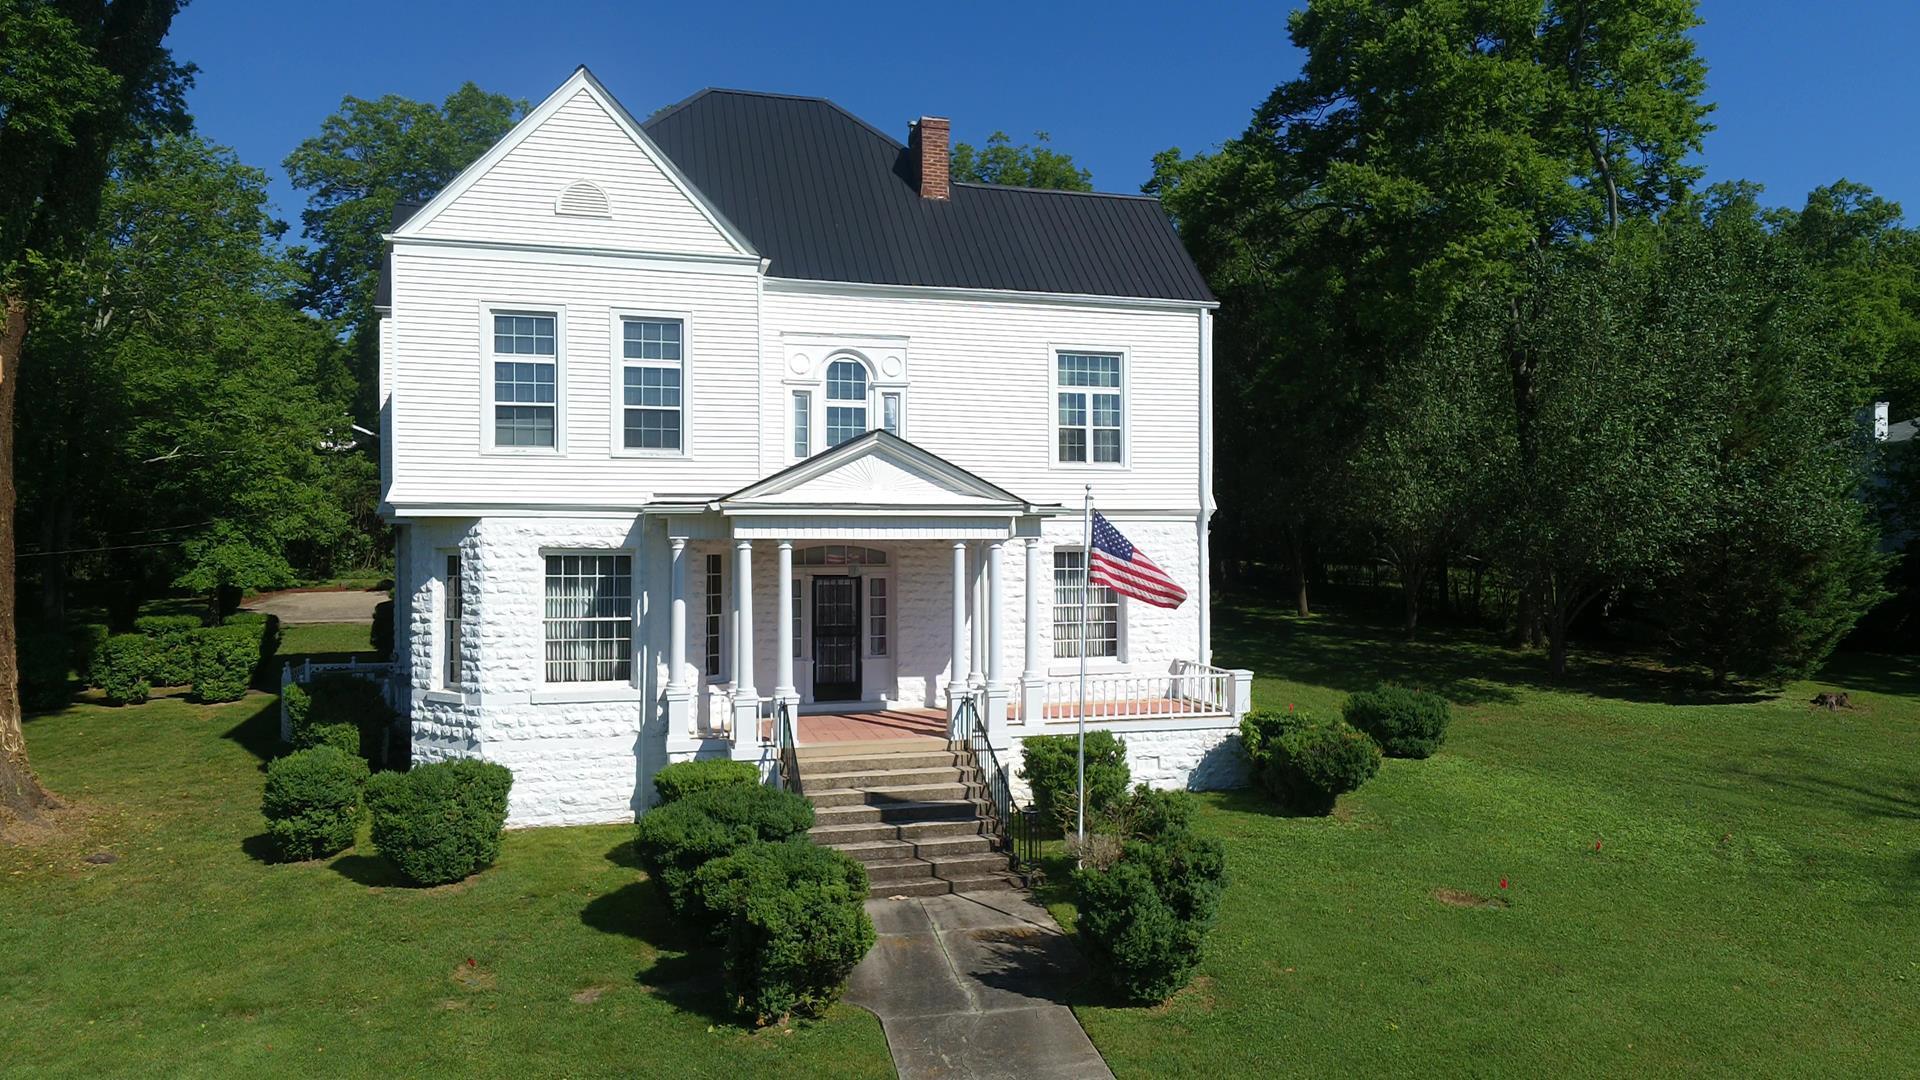 400 Mulberry Ave, Fayetteville, TN 37334 - Fayetteville, TN real estate listing